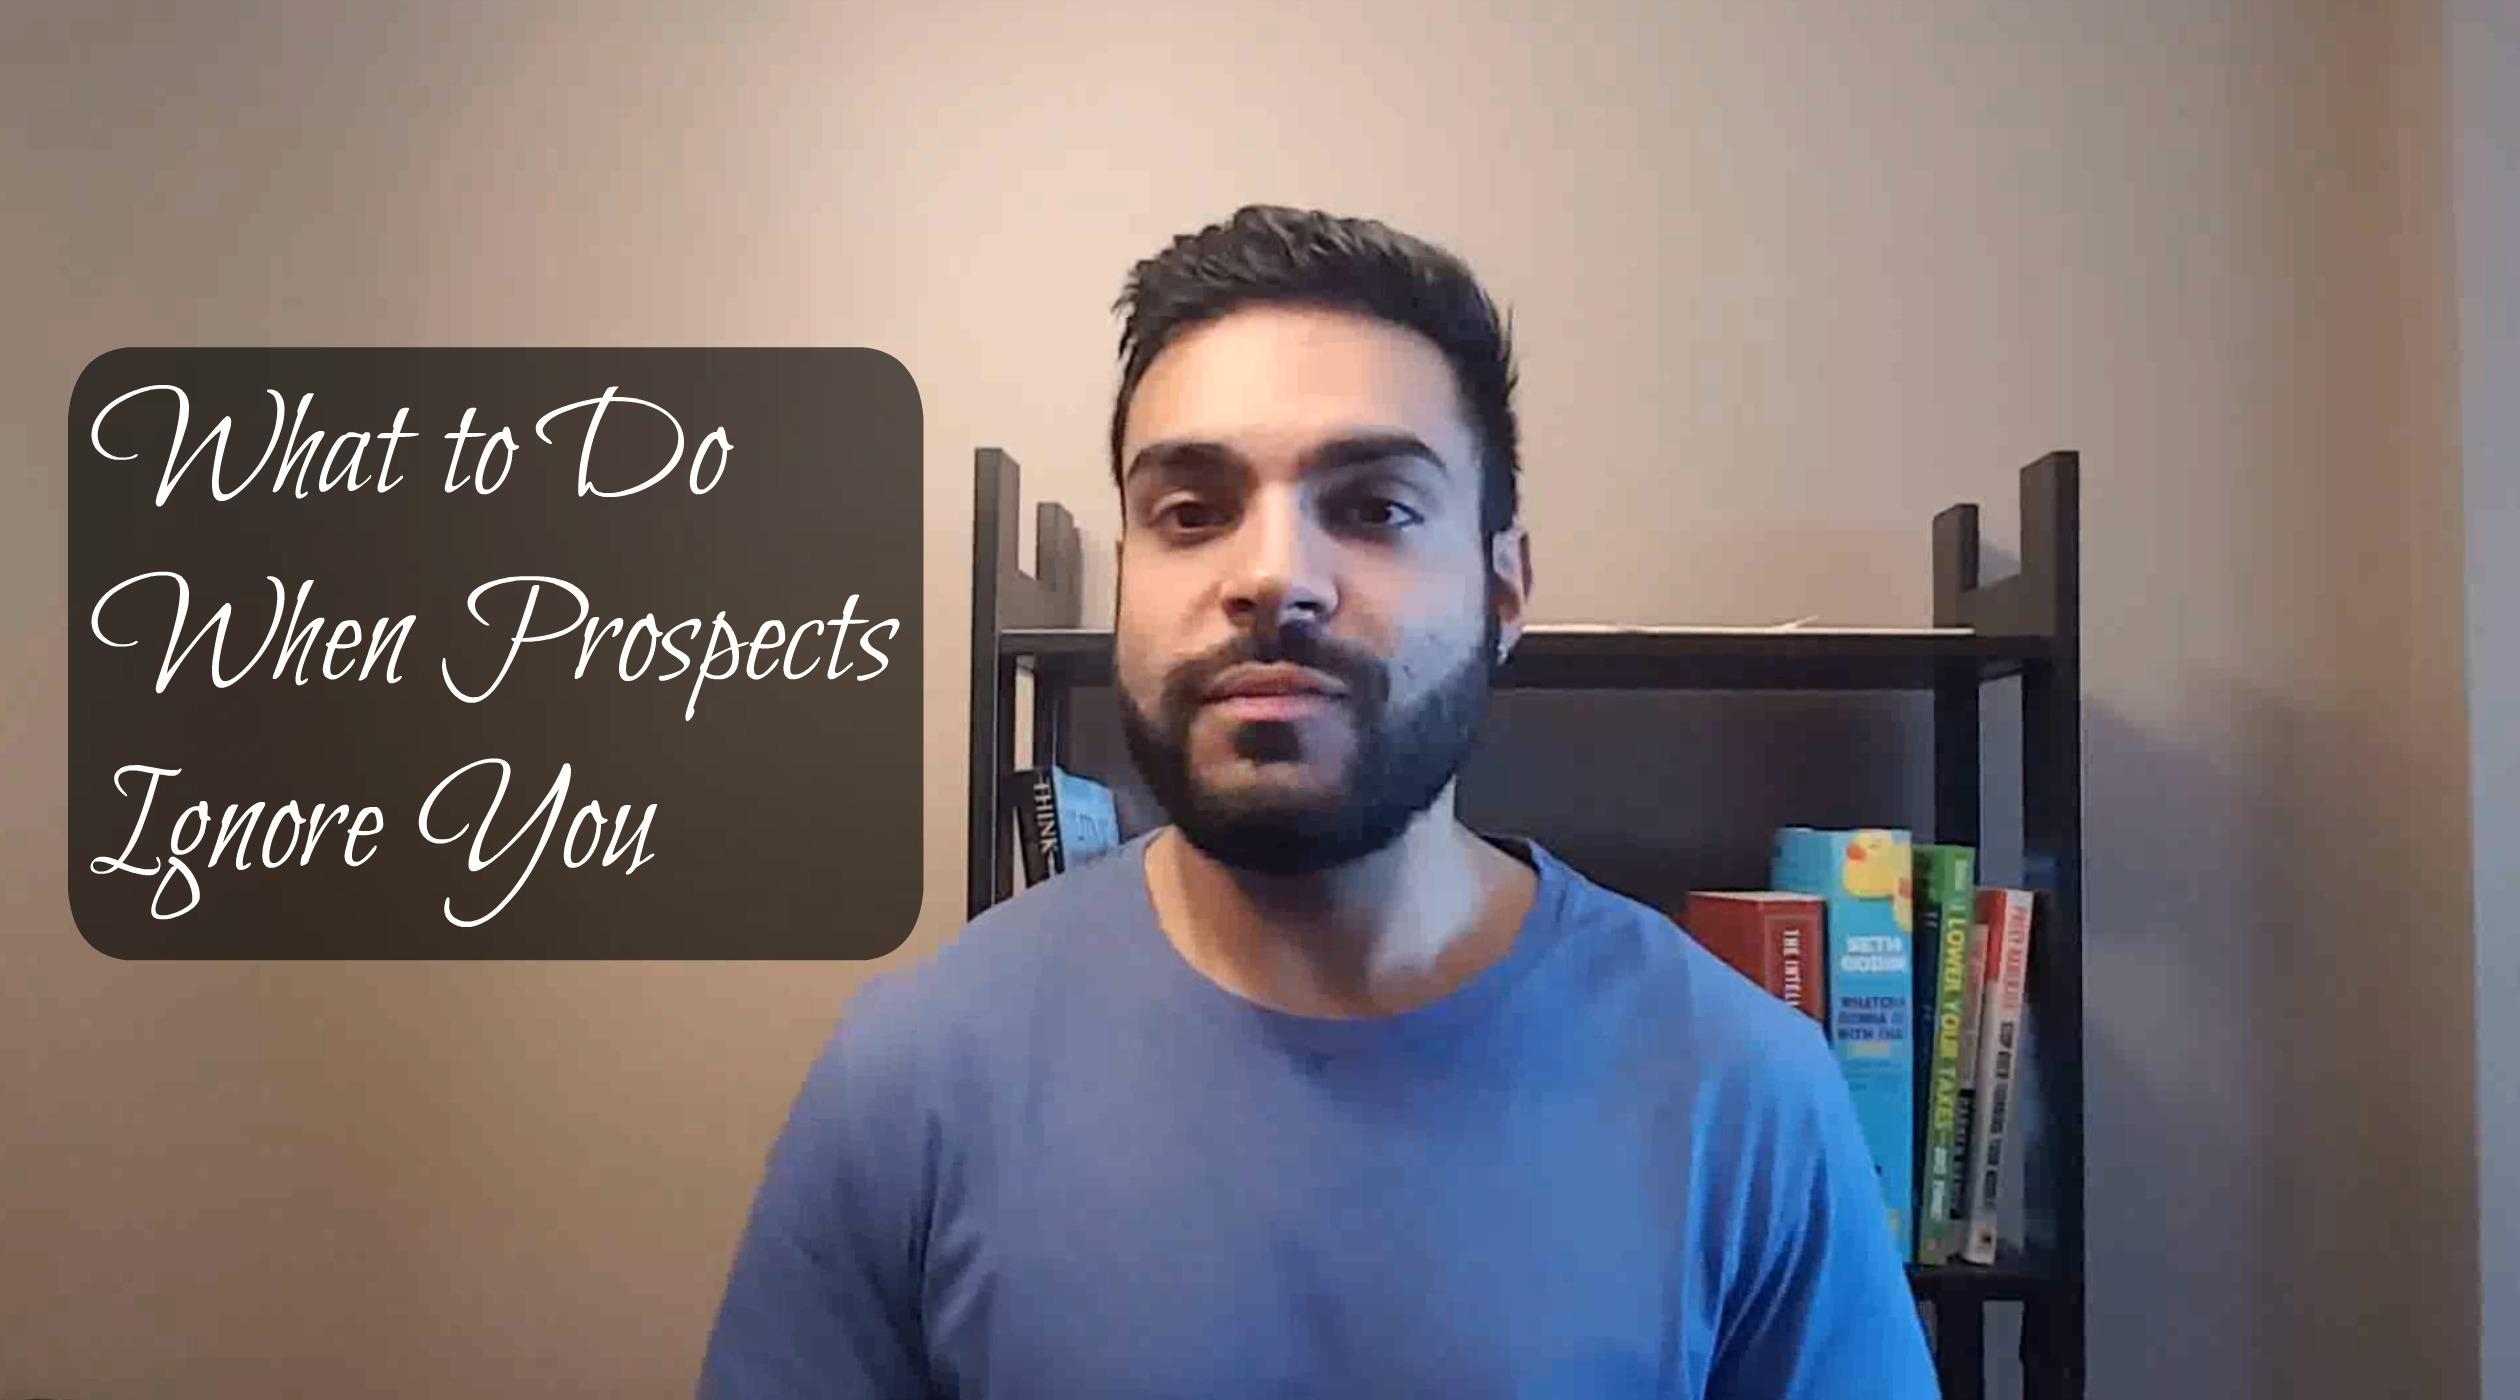 Network Marketing Prospects Ignoring You?